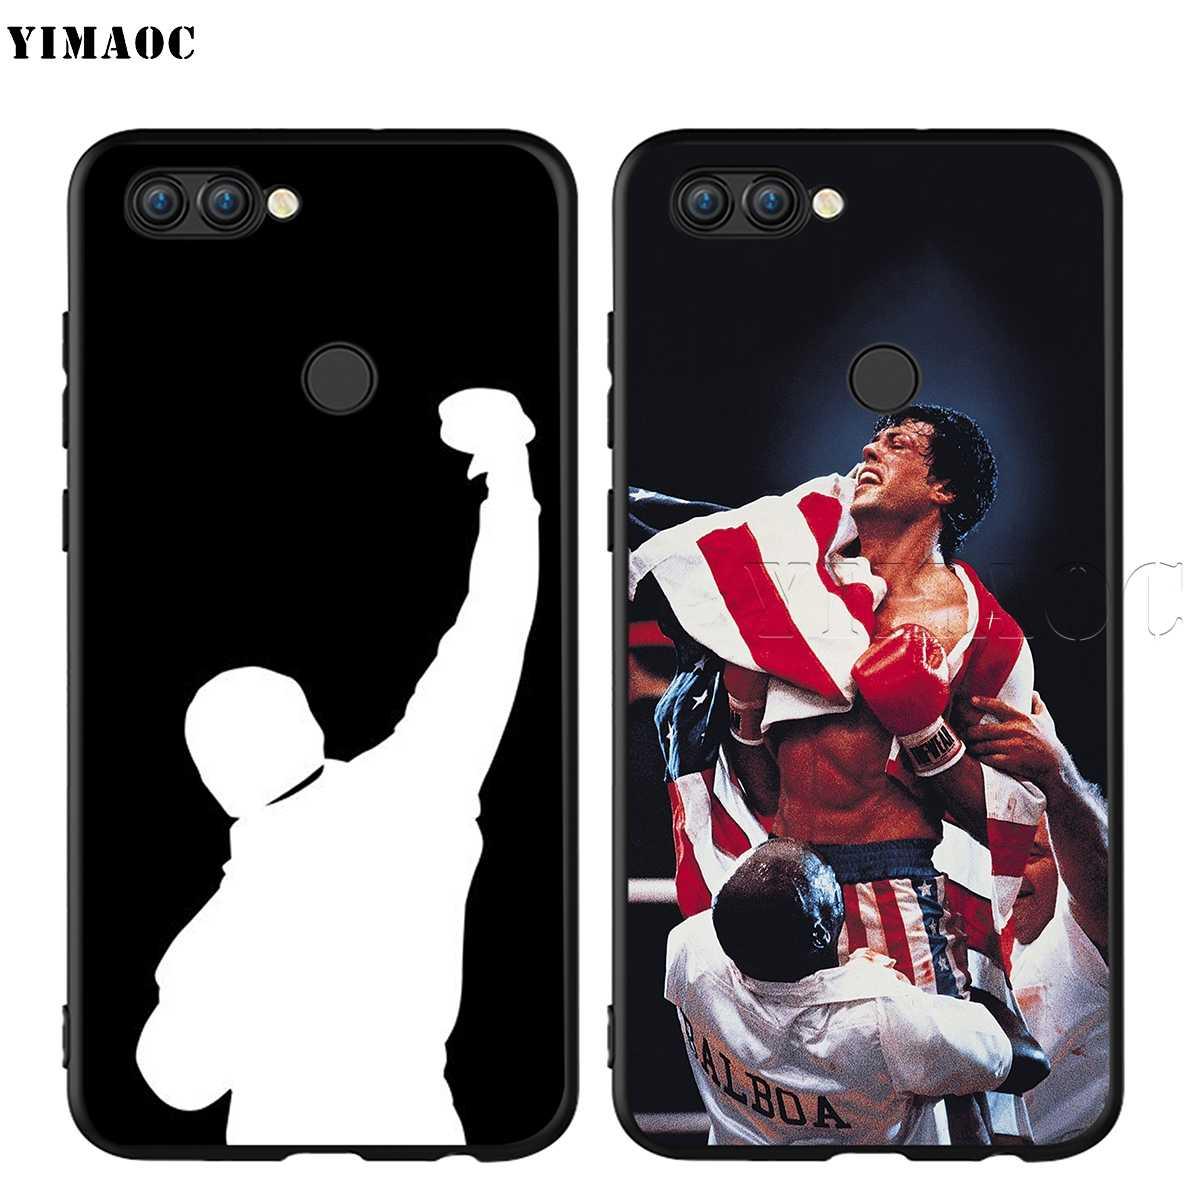 Yimaoc rocky balboa silicone caso para huawei companheiro 10 p8 p9 p10 p20 lite pro p y7 y9 inteligente mini 2017 2018